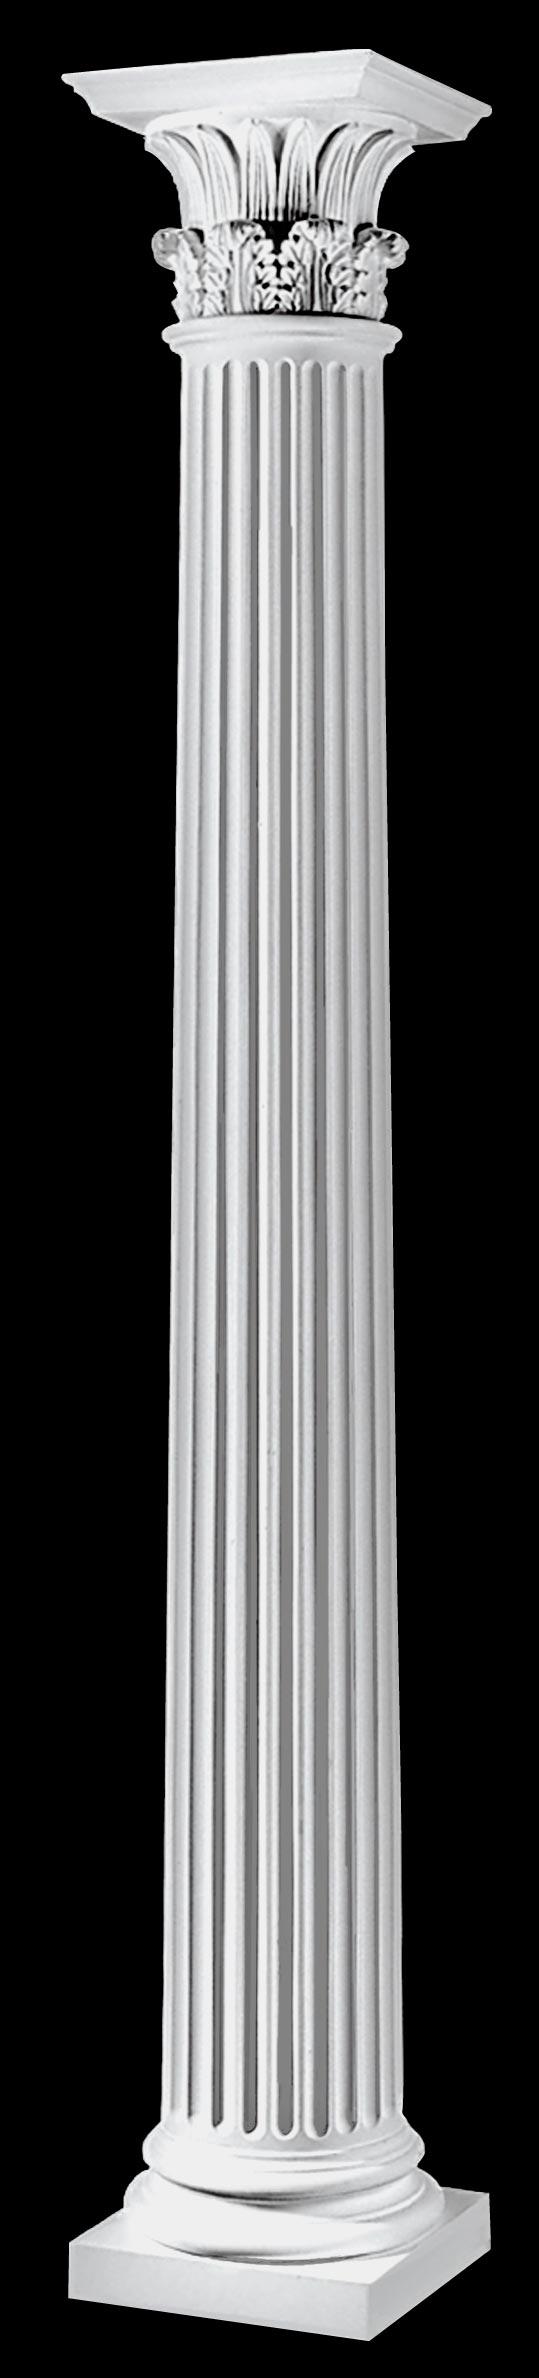 Fluted Architectural Wood Greek Corinthian Columns